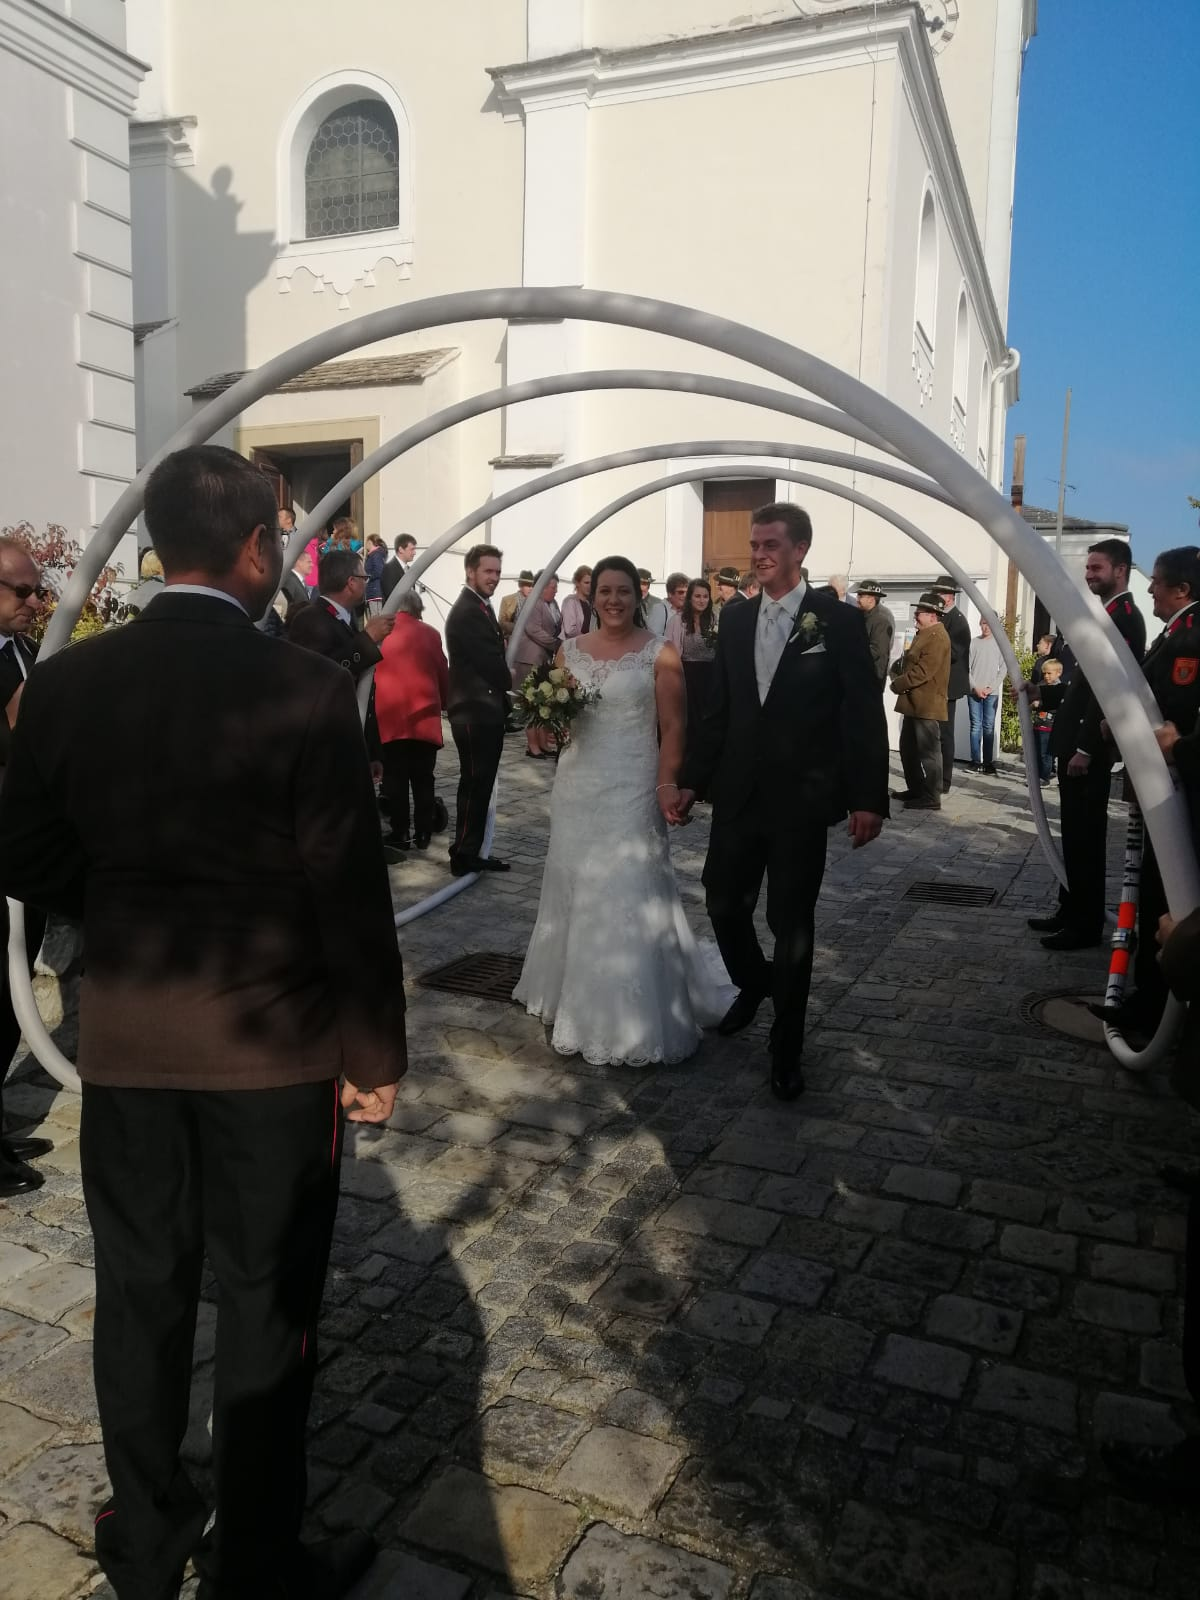 Das Brautpaar passiert den Schlauchtunnel.